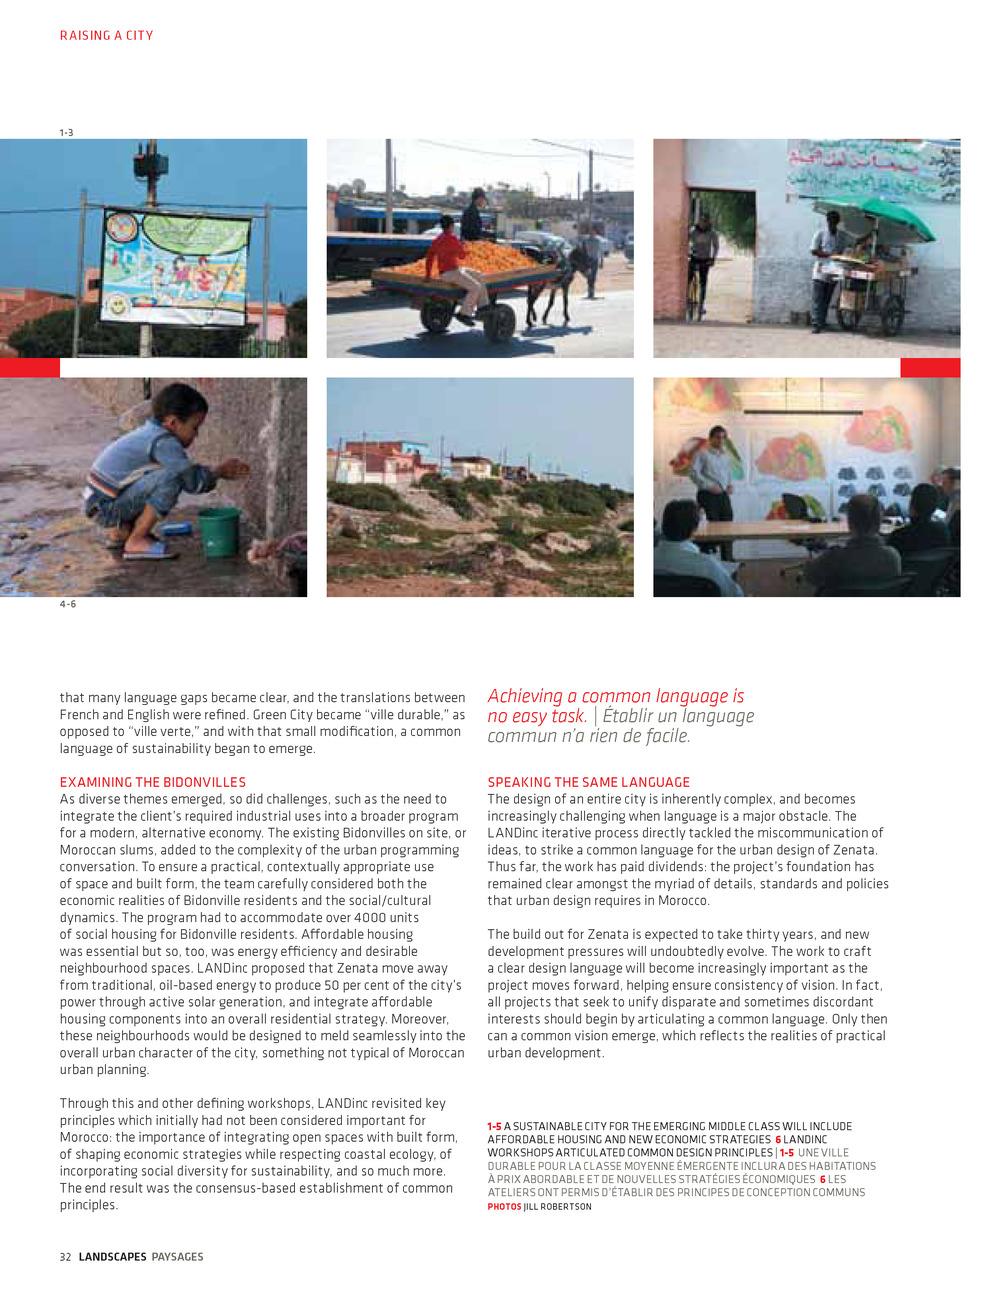 CSLA Zenata article_Page_3.jpg